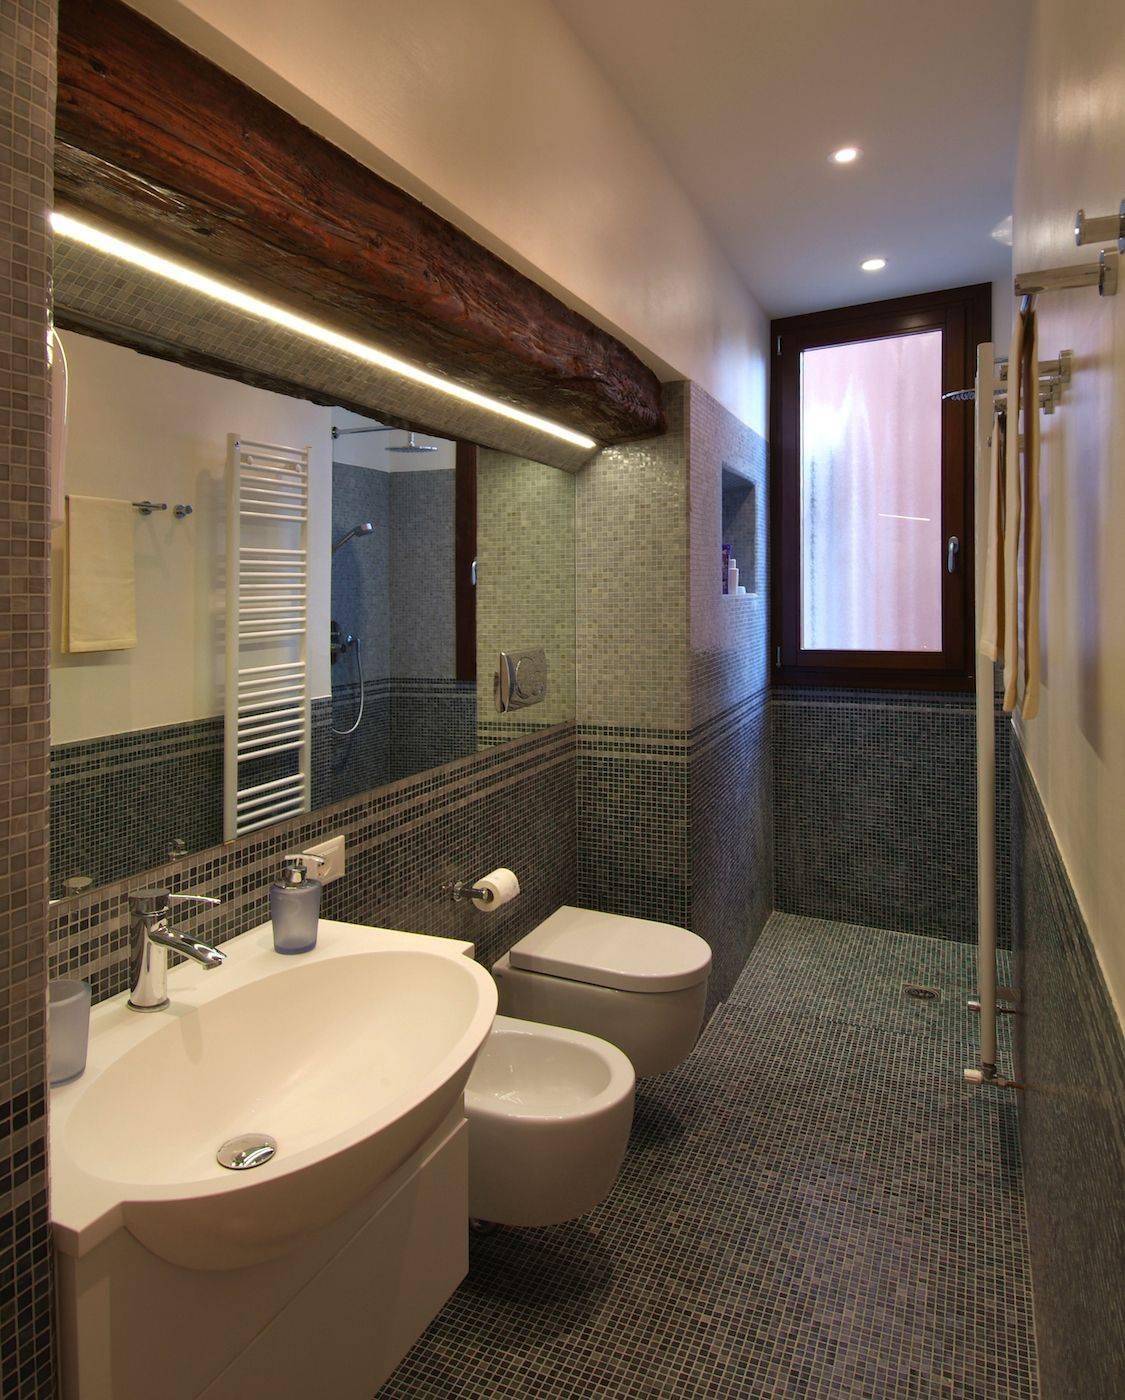 stylish and spacious bathroom with big shower